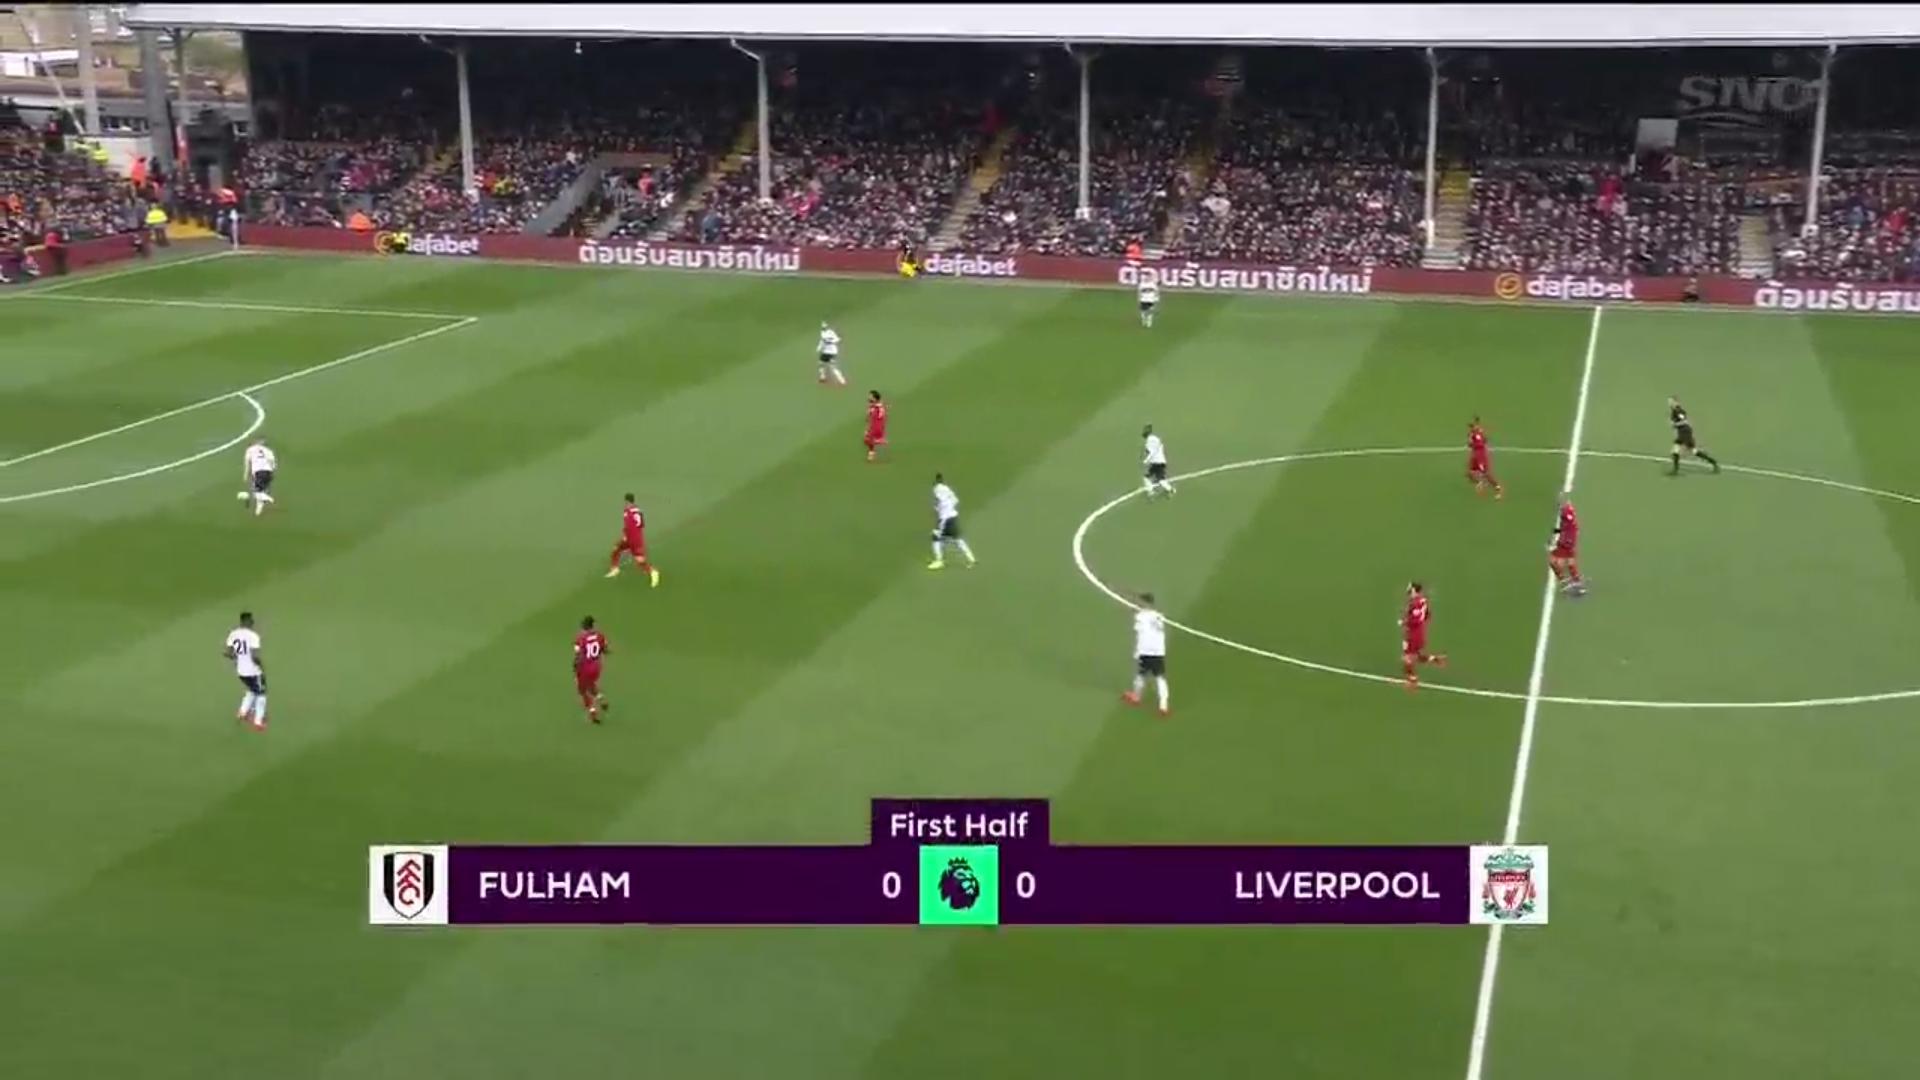 17-03-2019 - Fulham 1-2 Liverpool